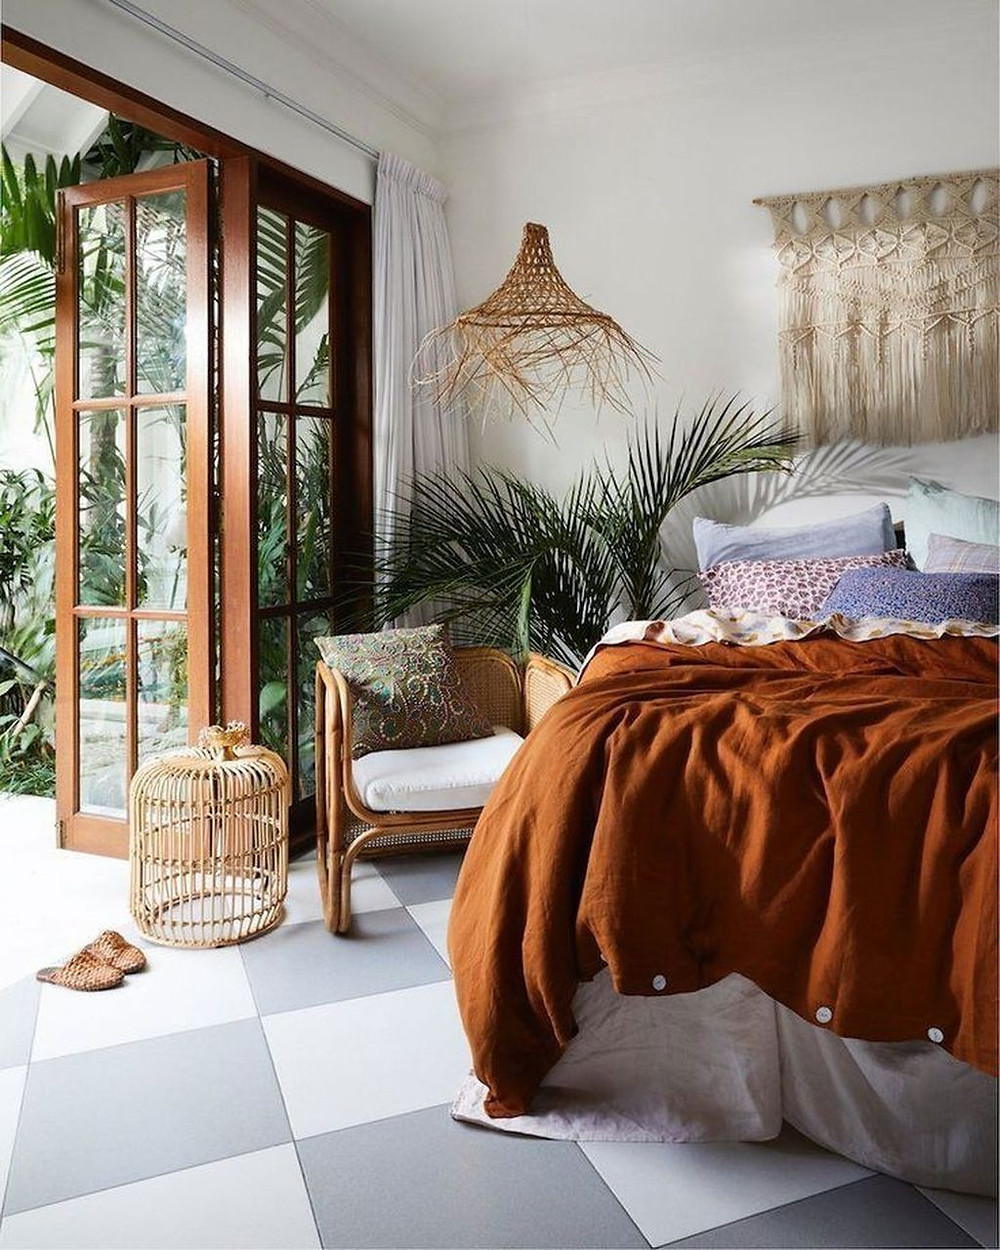 Cosy bedroom with earthy tones